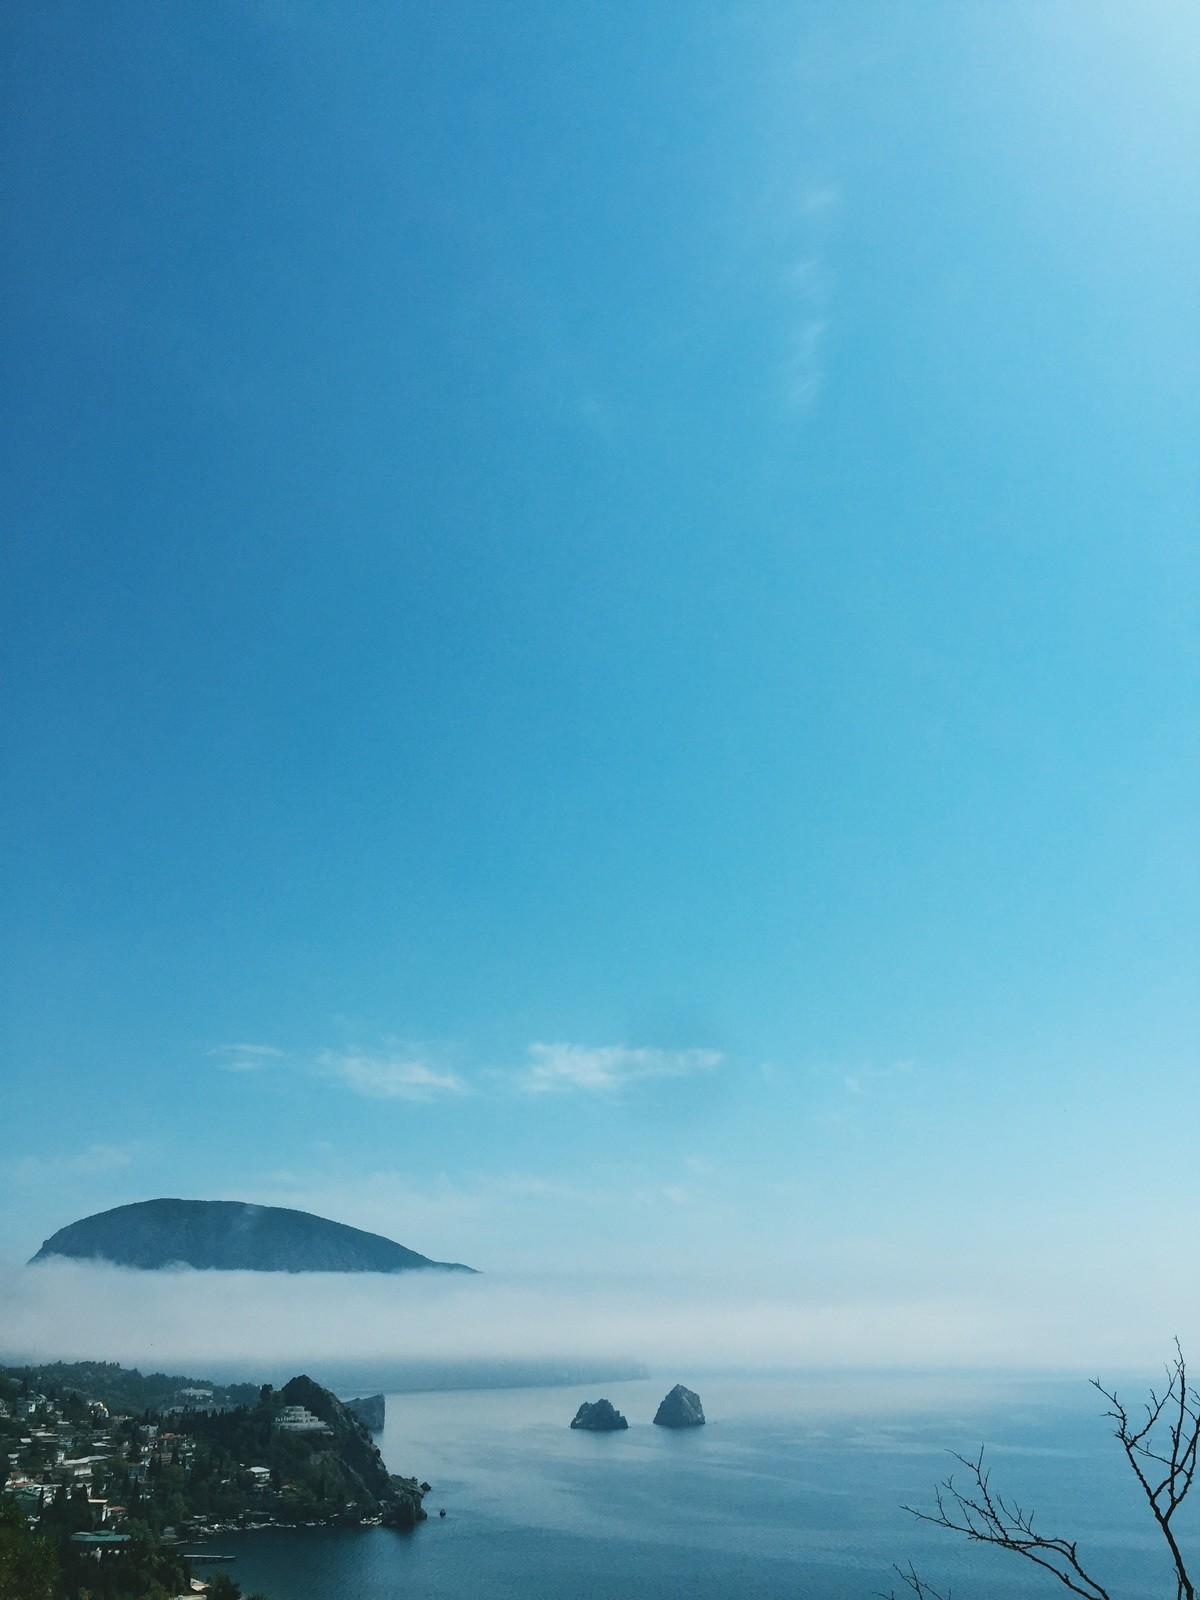 julia-karpacheva-paddleboarding-russia-black-sea-view